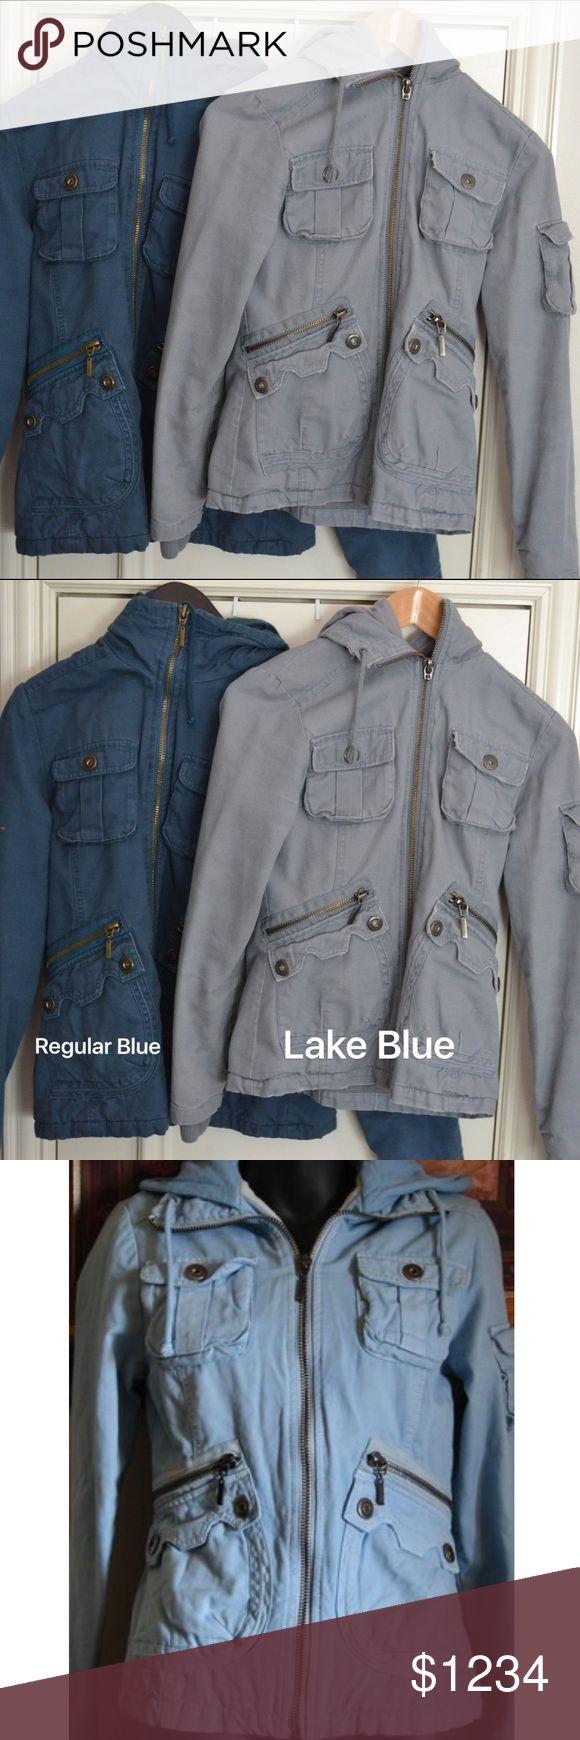 ISO (Not for Sale), BB Dakota Jacket Light Blue In search of BB Dakota Jacket in Light - Lake Blue. Preferably size Small-Medium. Thank you!! BB Dakota Jackets & Coats